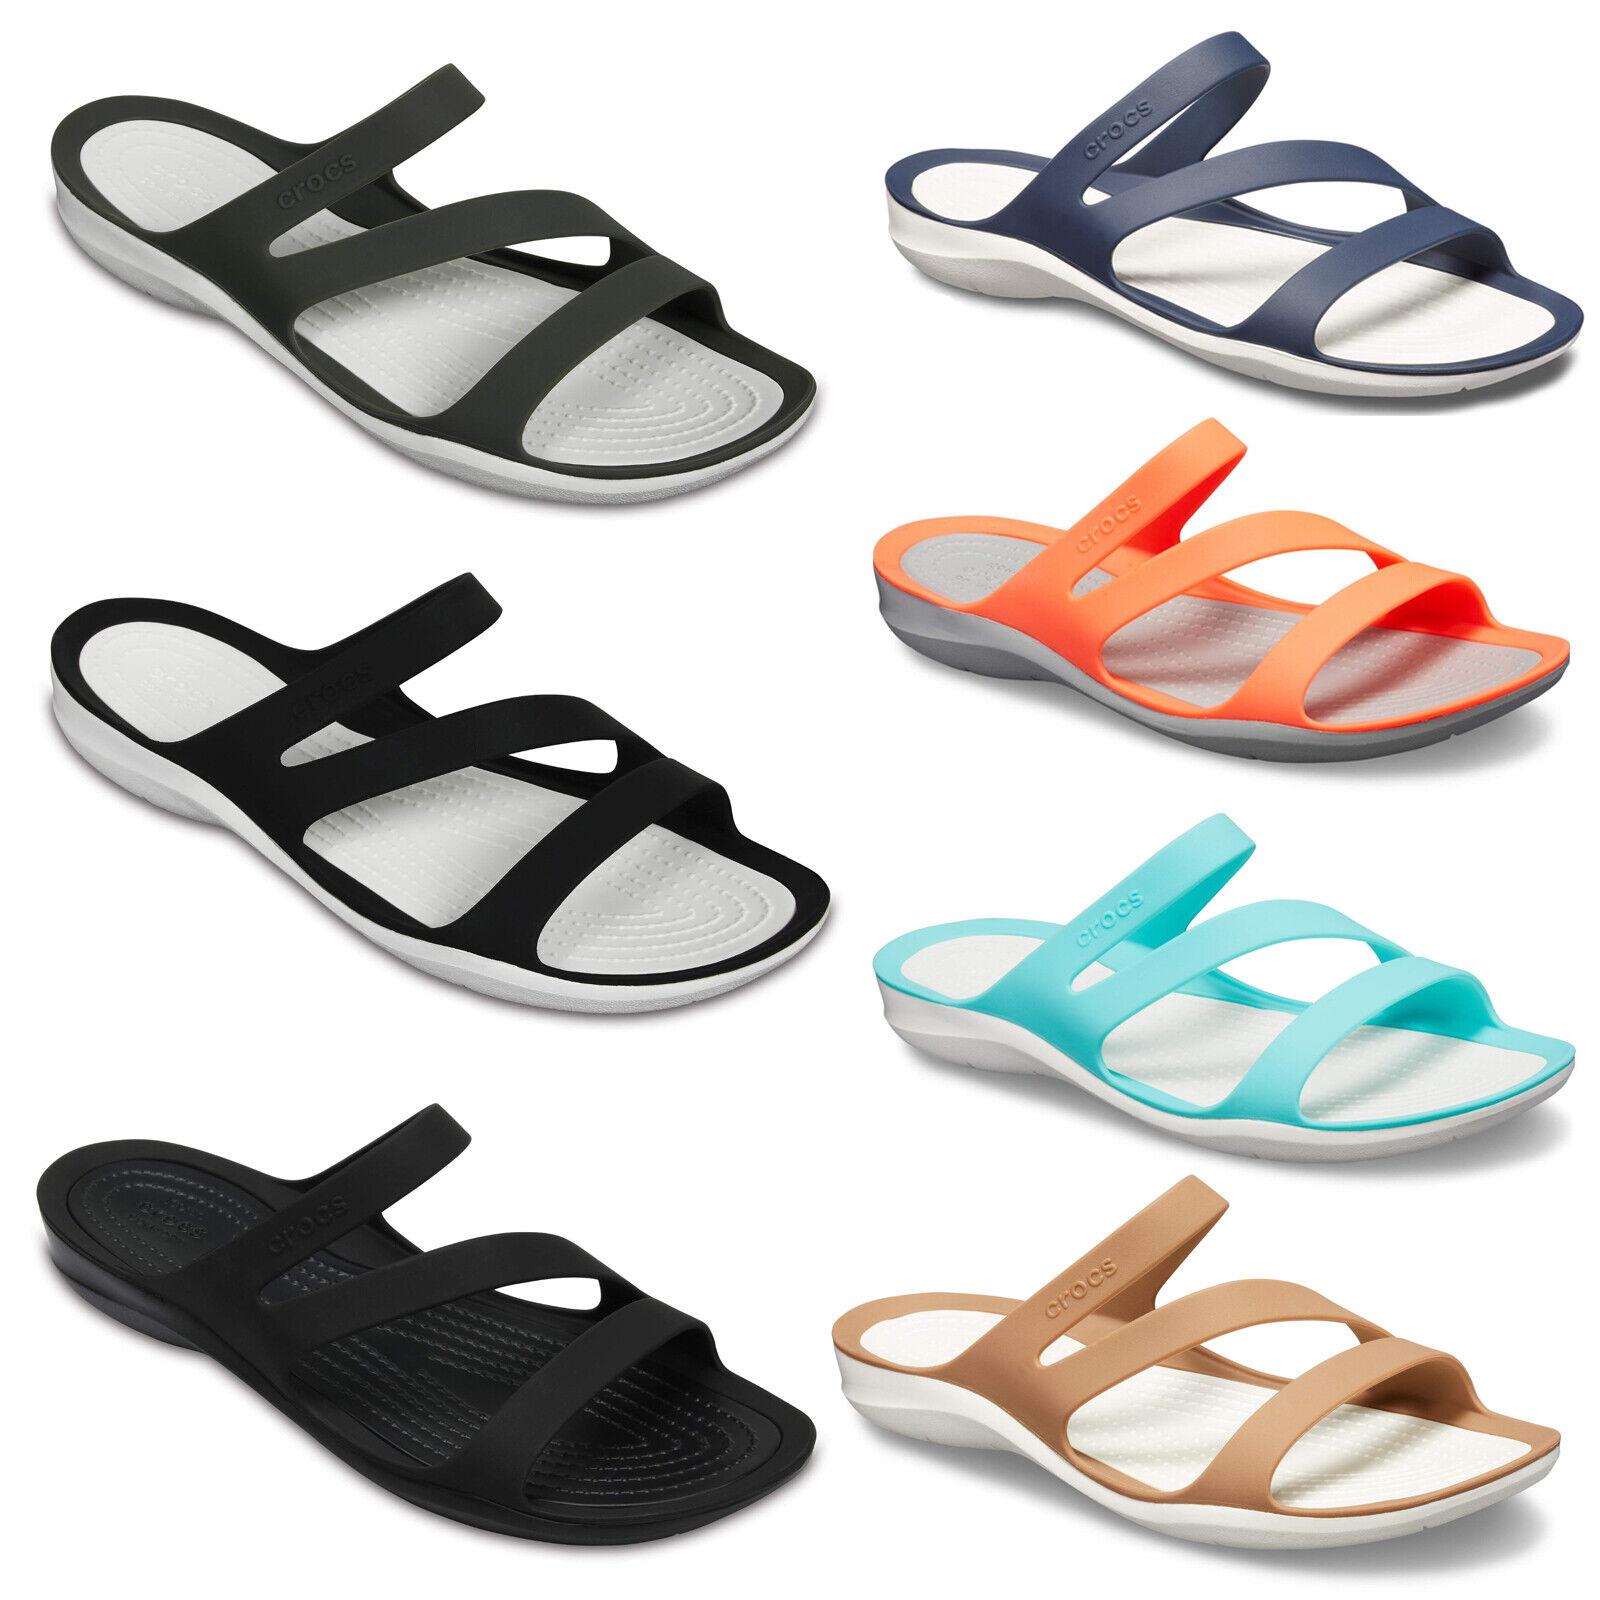 Crocs Sandals Swiftwater Beach Holiday Womens Slip On 2020 Open Toe UK 4-8